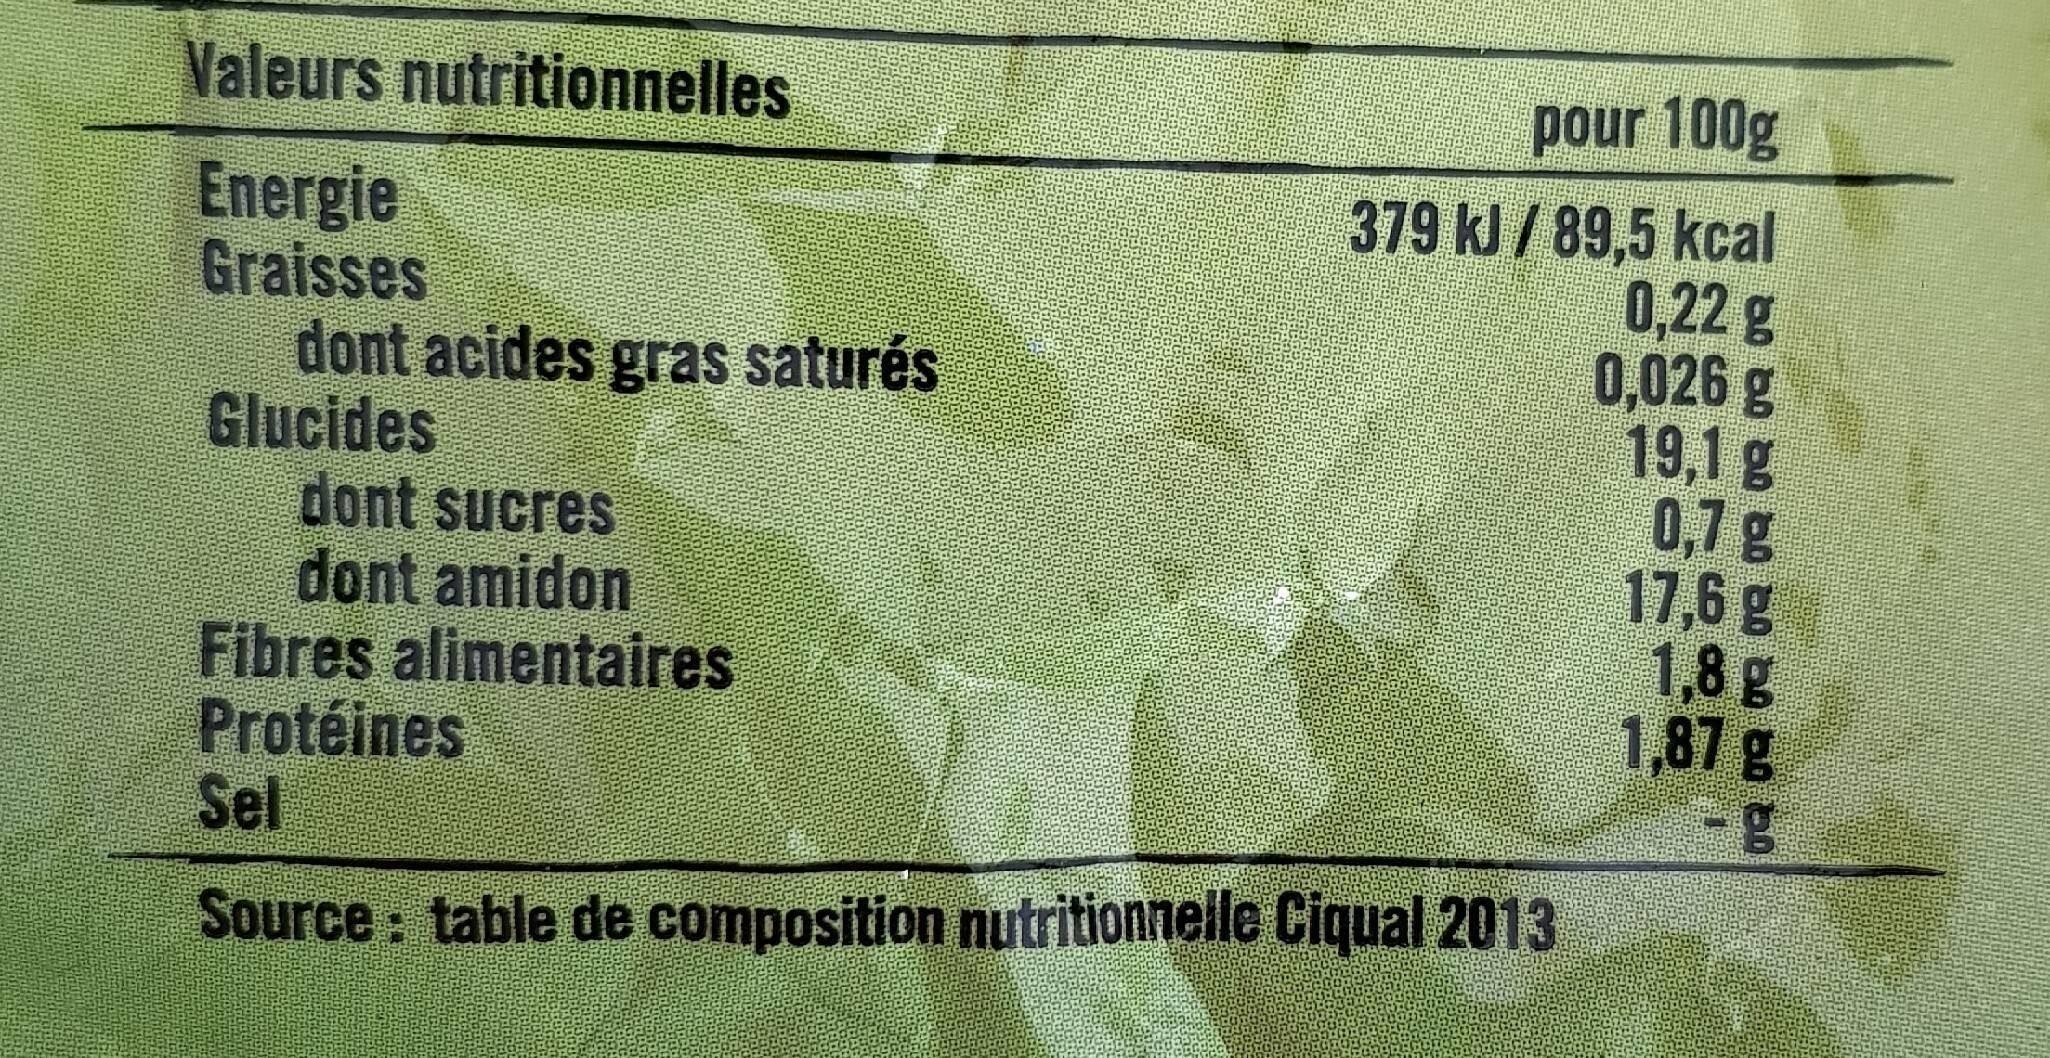 Pomme de terre Primeale Blanches salade risolees - Informations nutritionnelles - fr